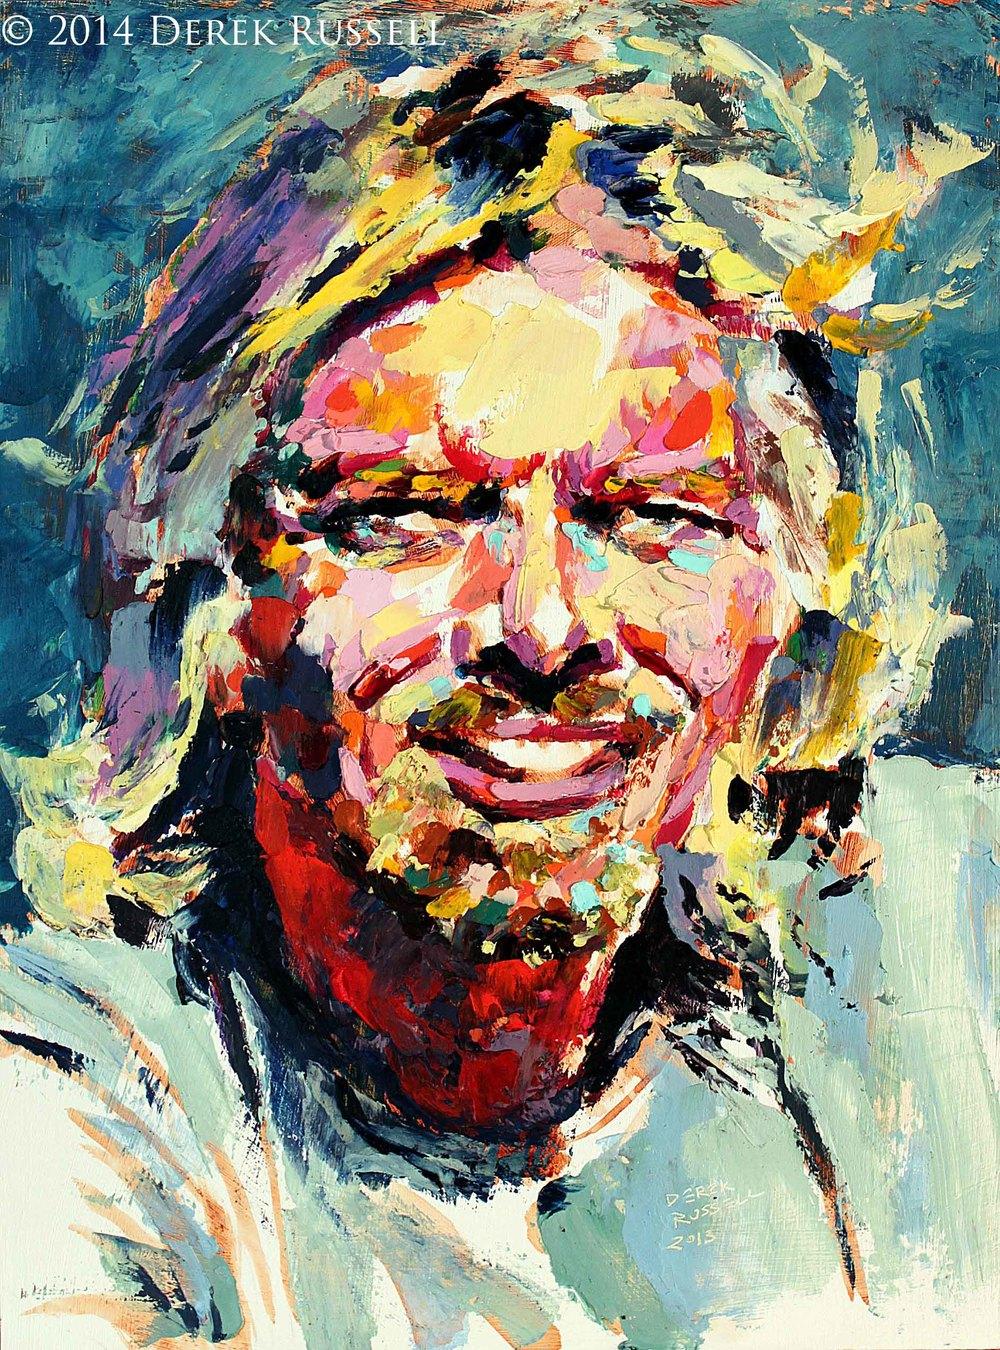 Original Fine Art Oil Portrait Painting by portrait & nature fine artist Derek Russell